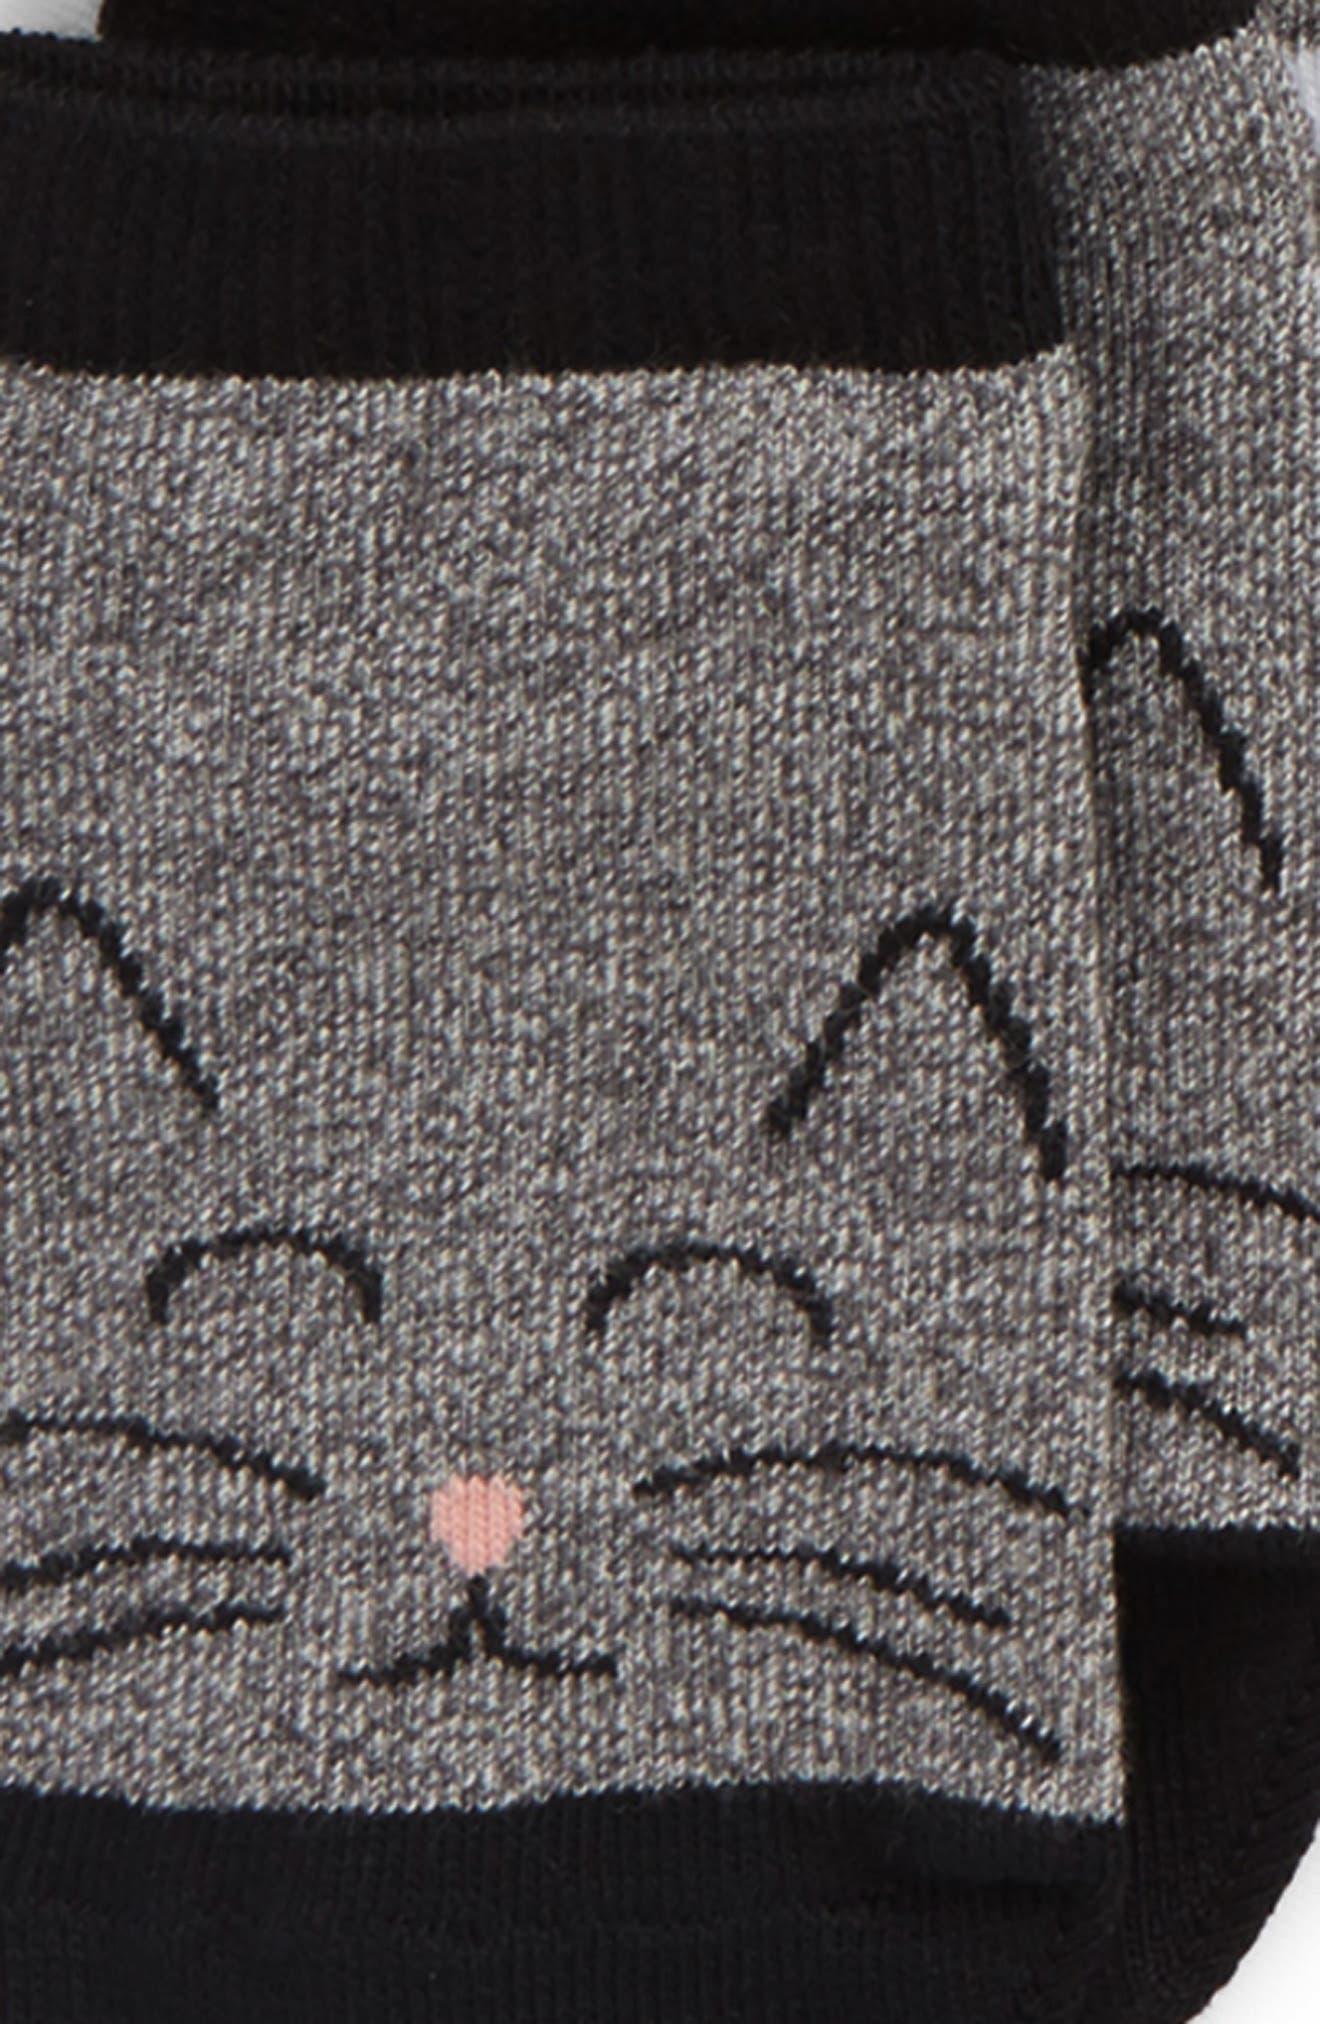 6-Pack Assorted Low Cut Socks,                             Alternate thumbnail 2, color,                             002